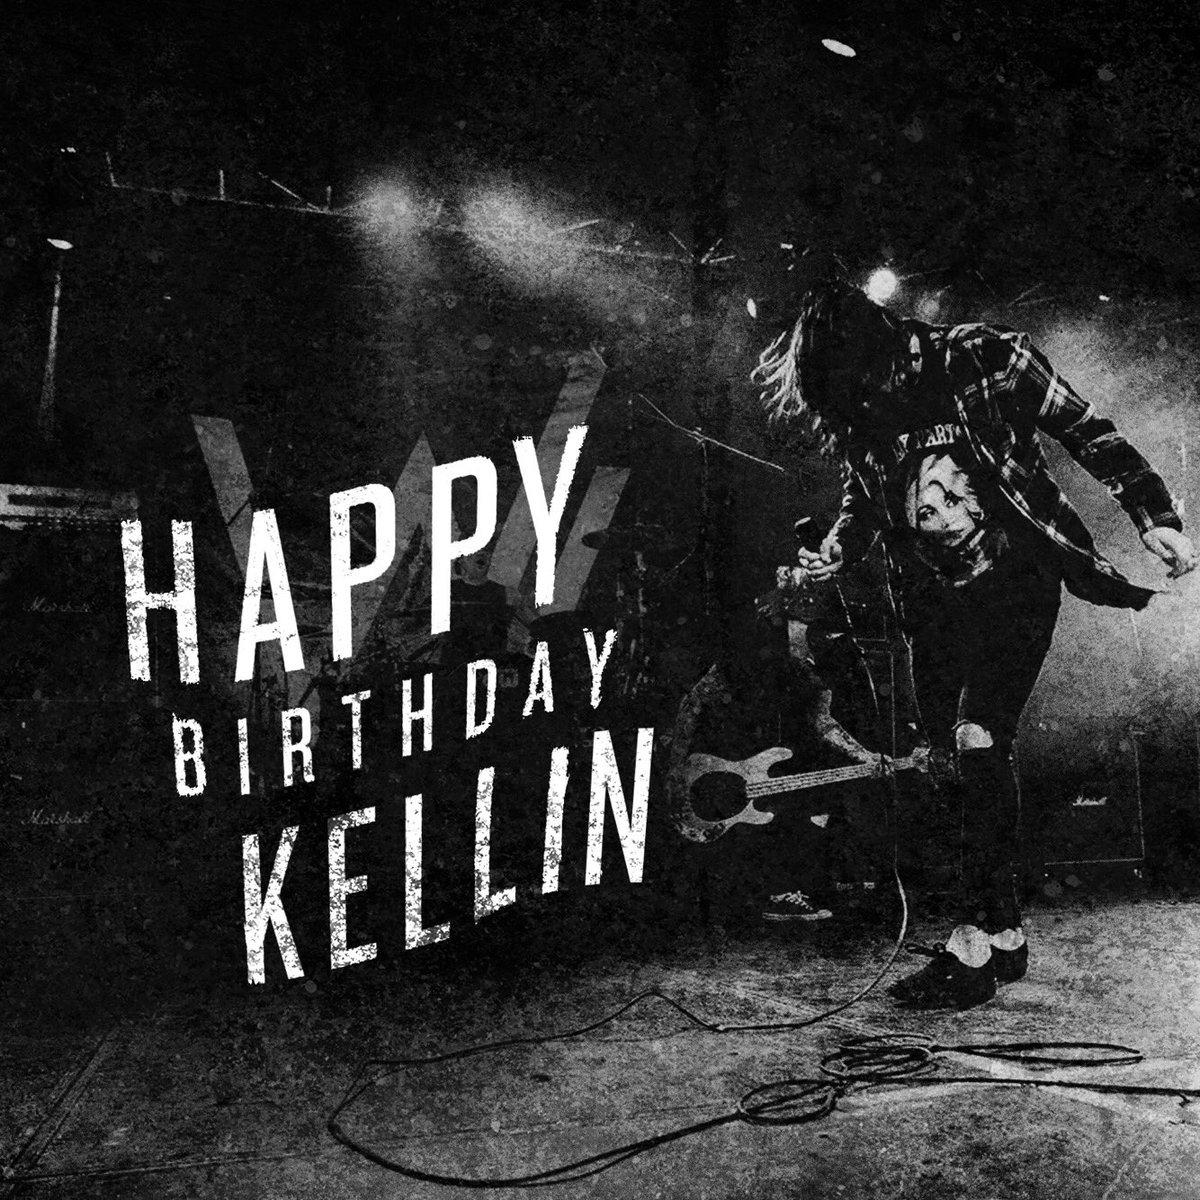 Happy birthday @kellinquinn!!